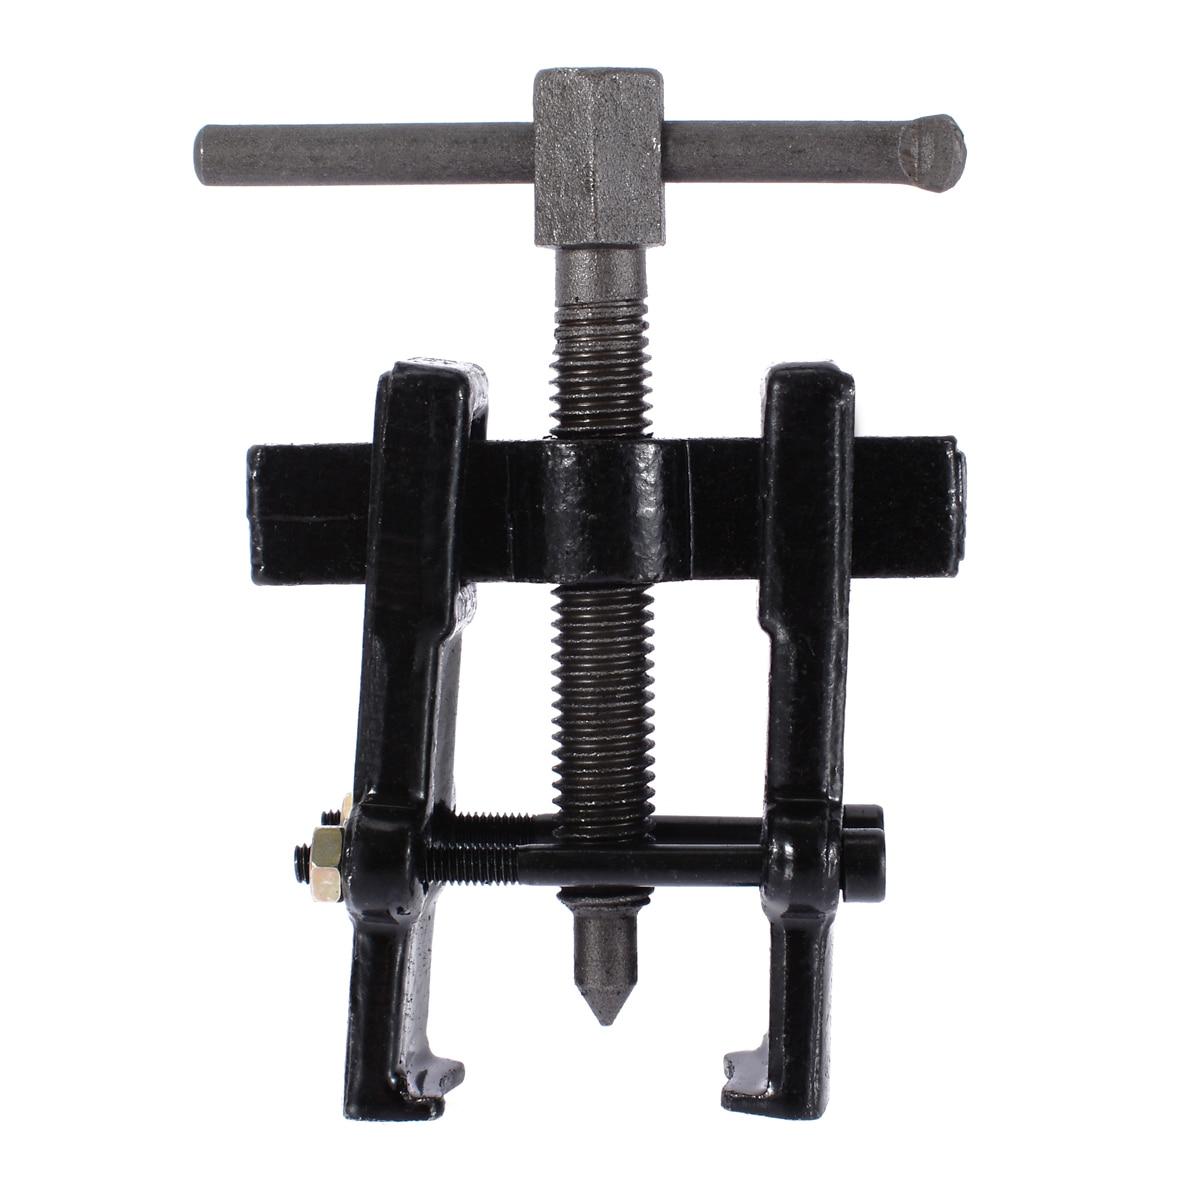 "Купить с кэшбэком New Two Jaw Gear Pulley Bearing Puller Set for Car Installation Remover Hand Tool Kit 2"" 4"" 6"" Small Leg Large Mechanics"